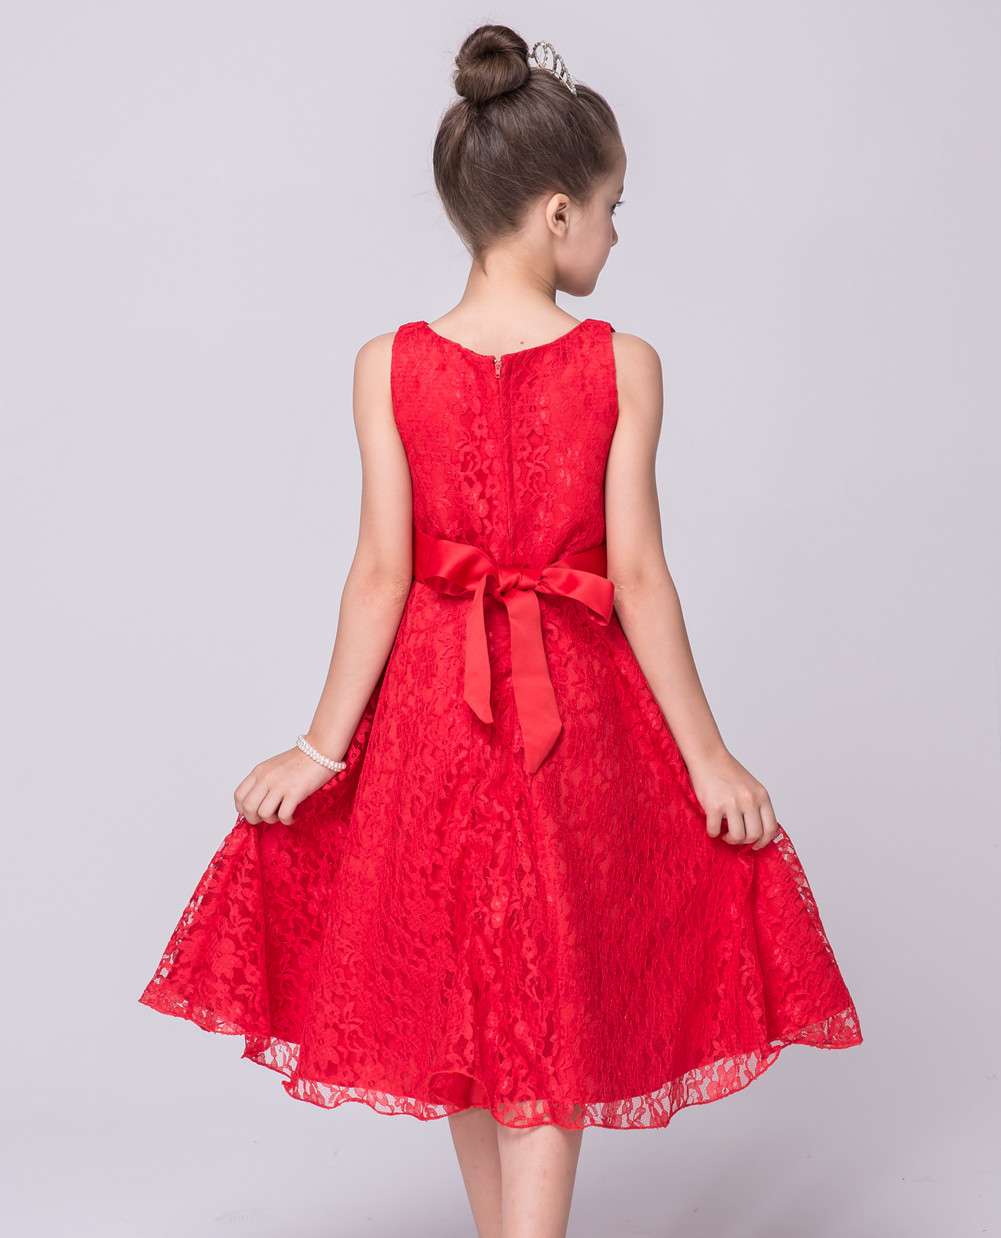 Dress Girls Last Princess 64